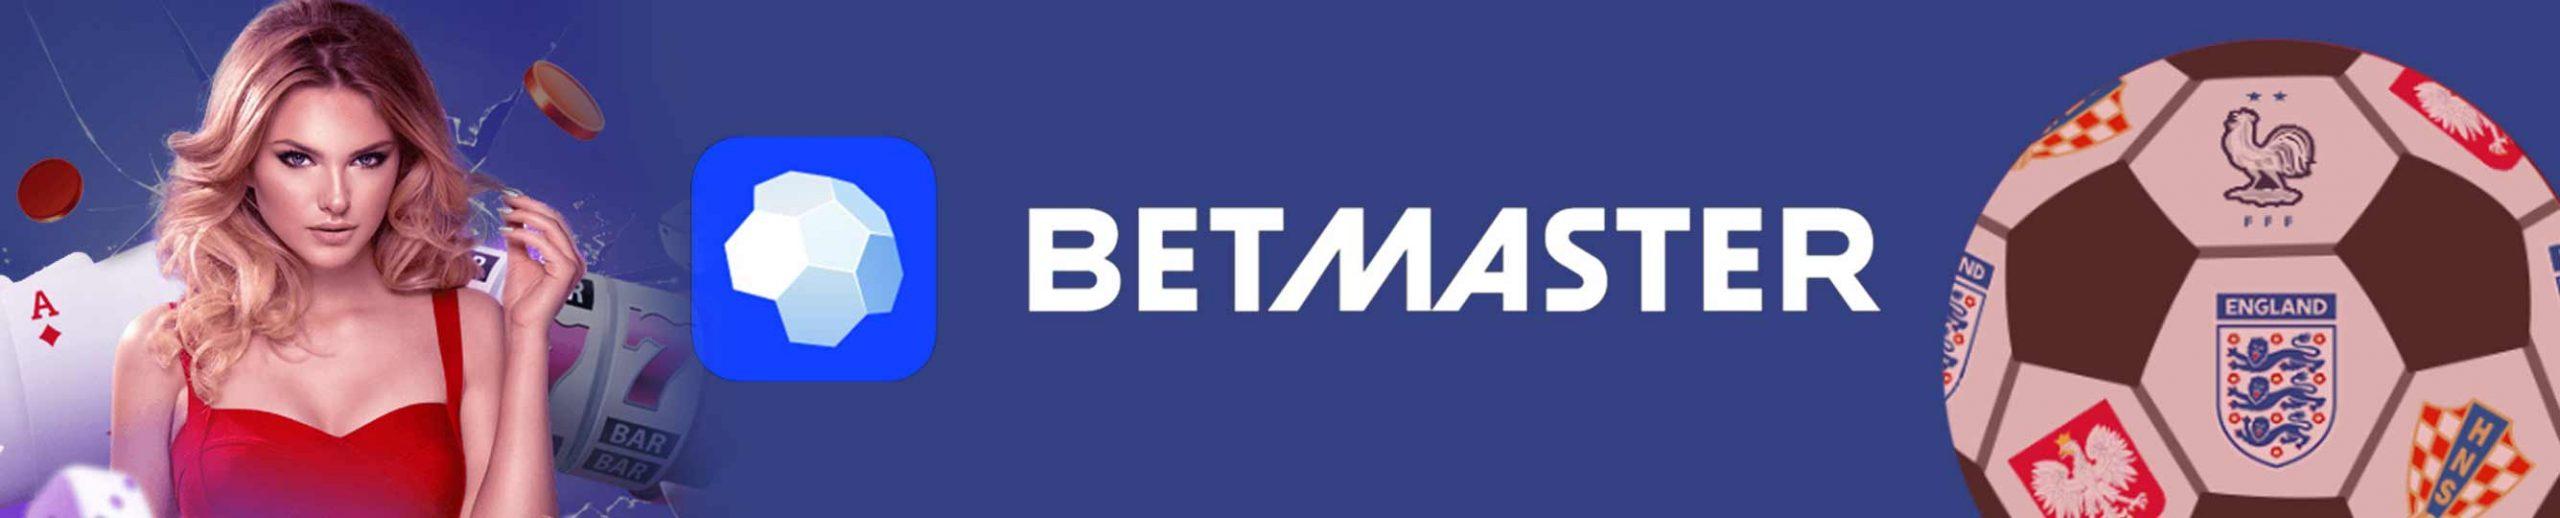 Betmaster-Casinotest